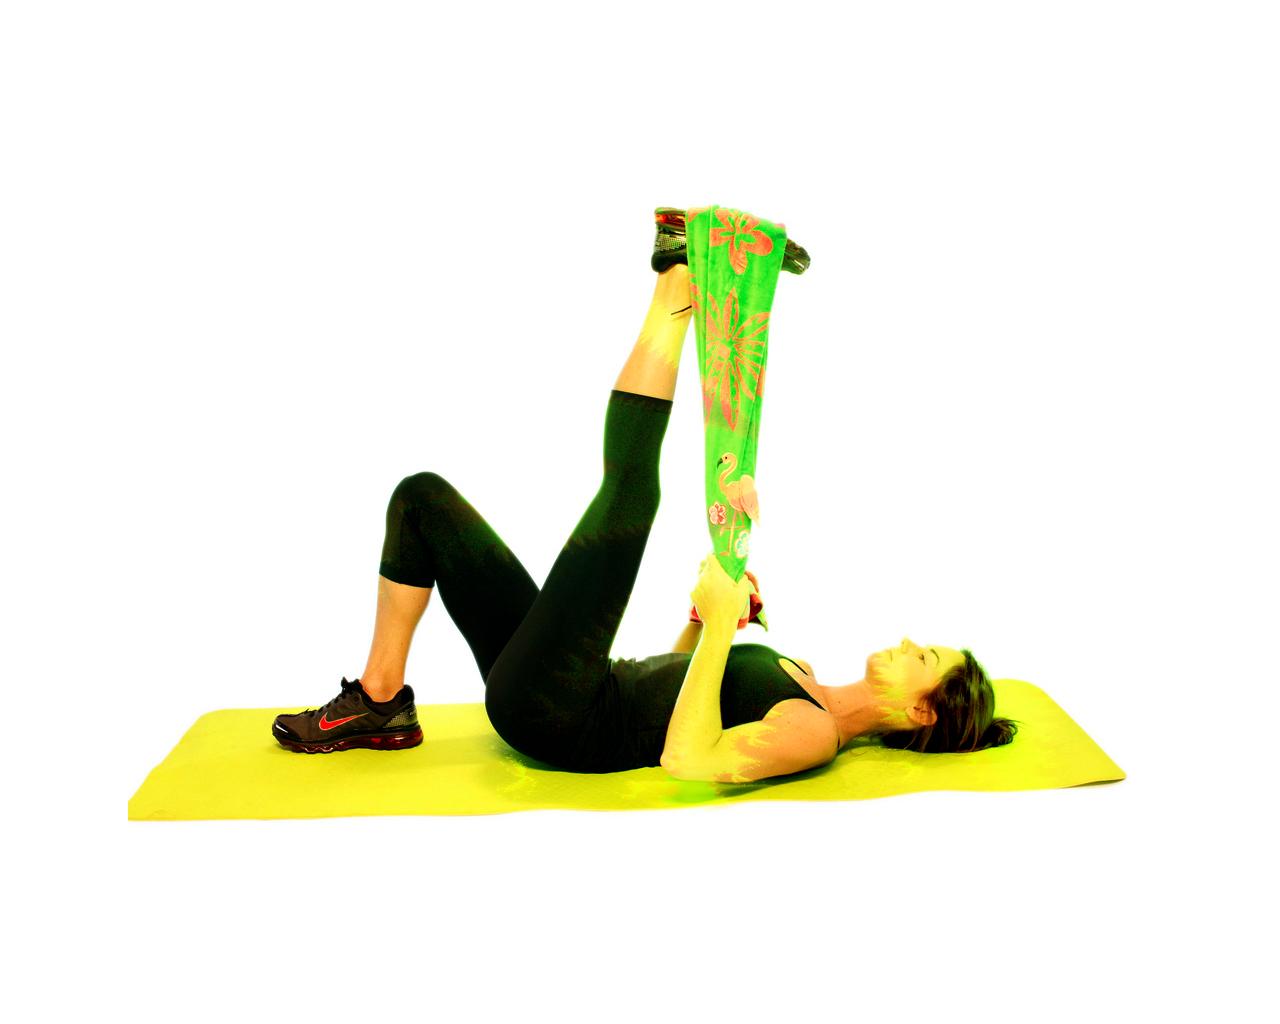 http://4.bp.blogspot.com/_SUc32IeRmz8/TEOamsF88pI/AAAAAAAAABY/mKvigTQpUQQ/s1600/fitnessgirl04.jpg